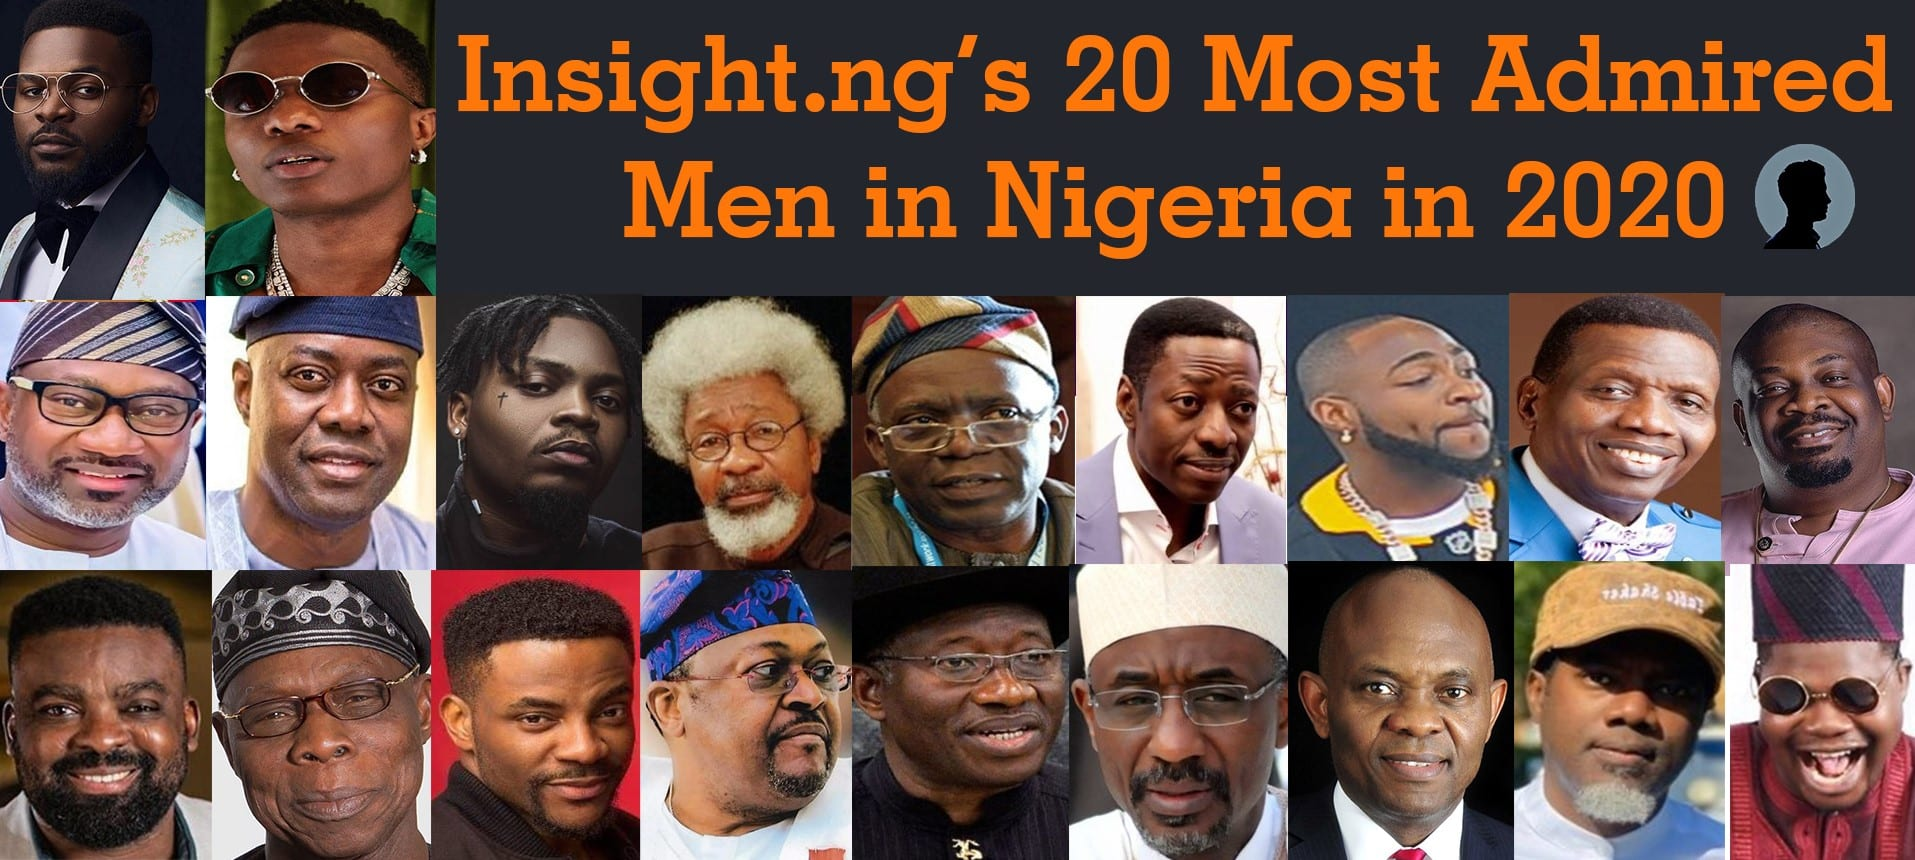 20 most admired men in Nigeria